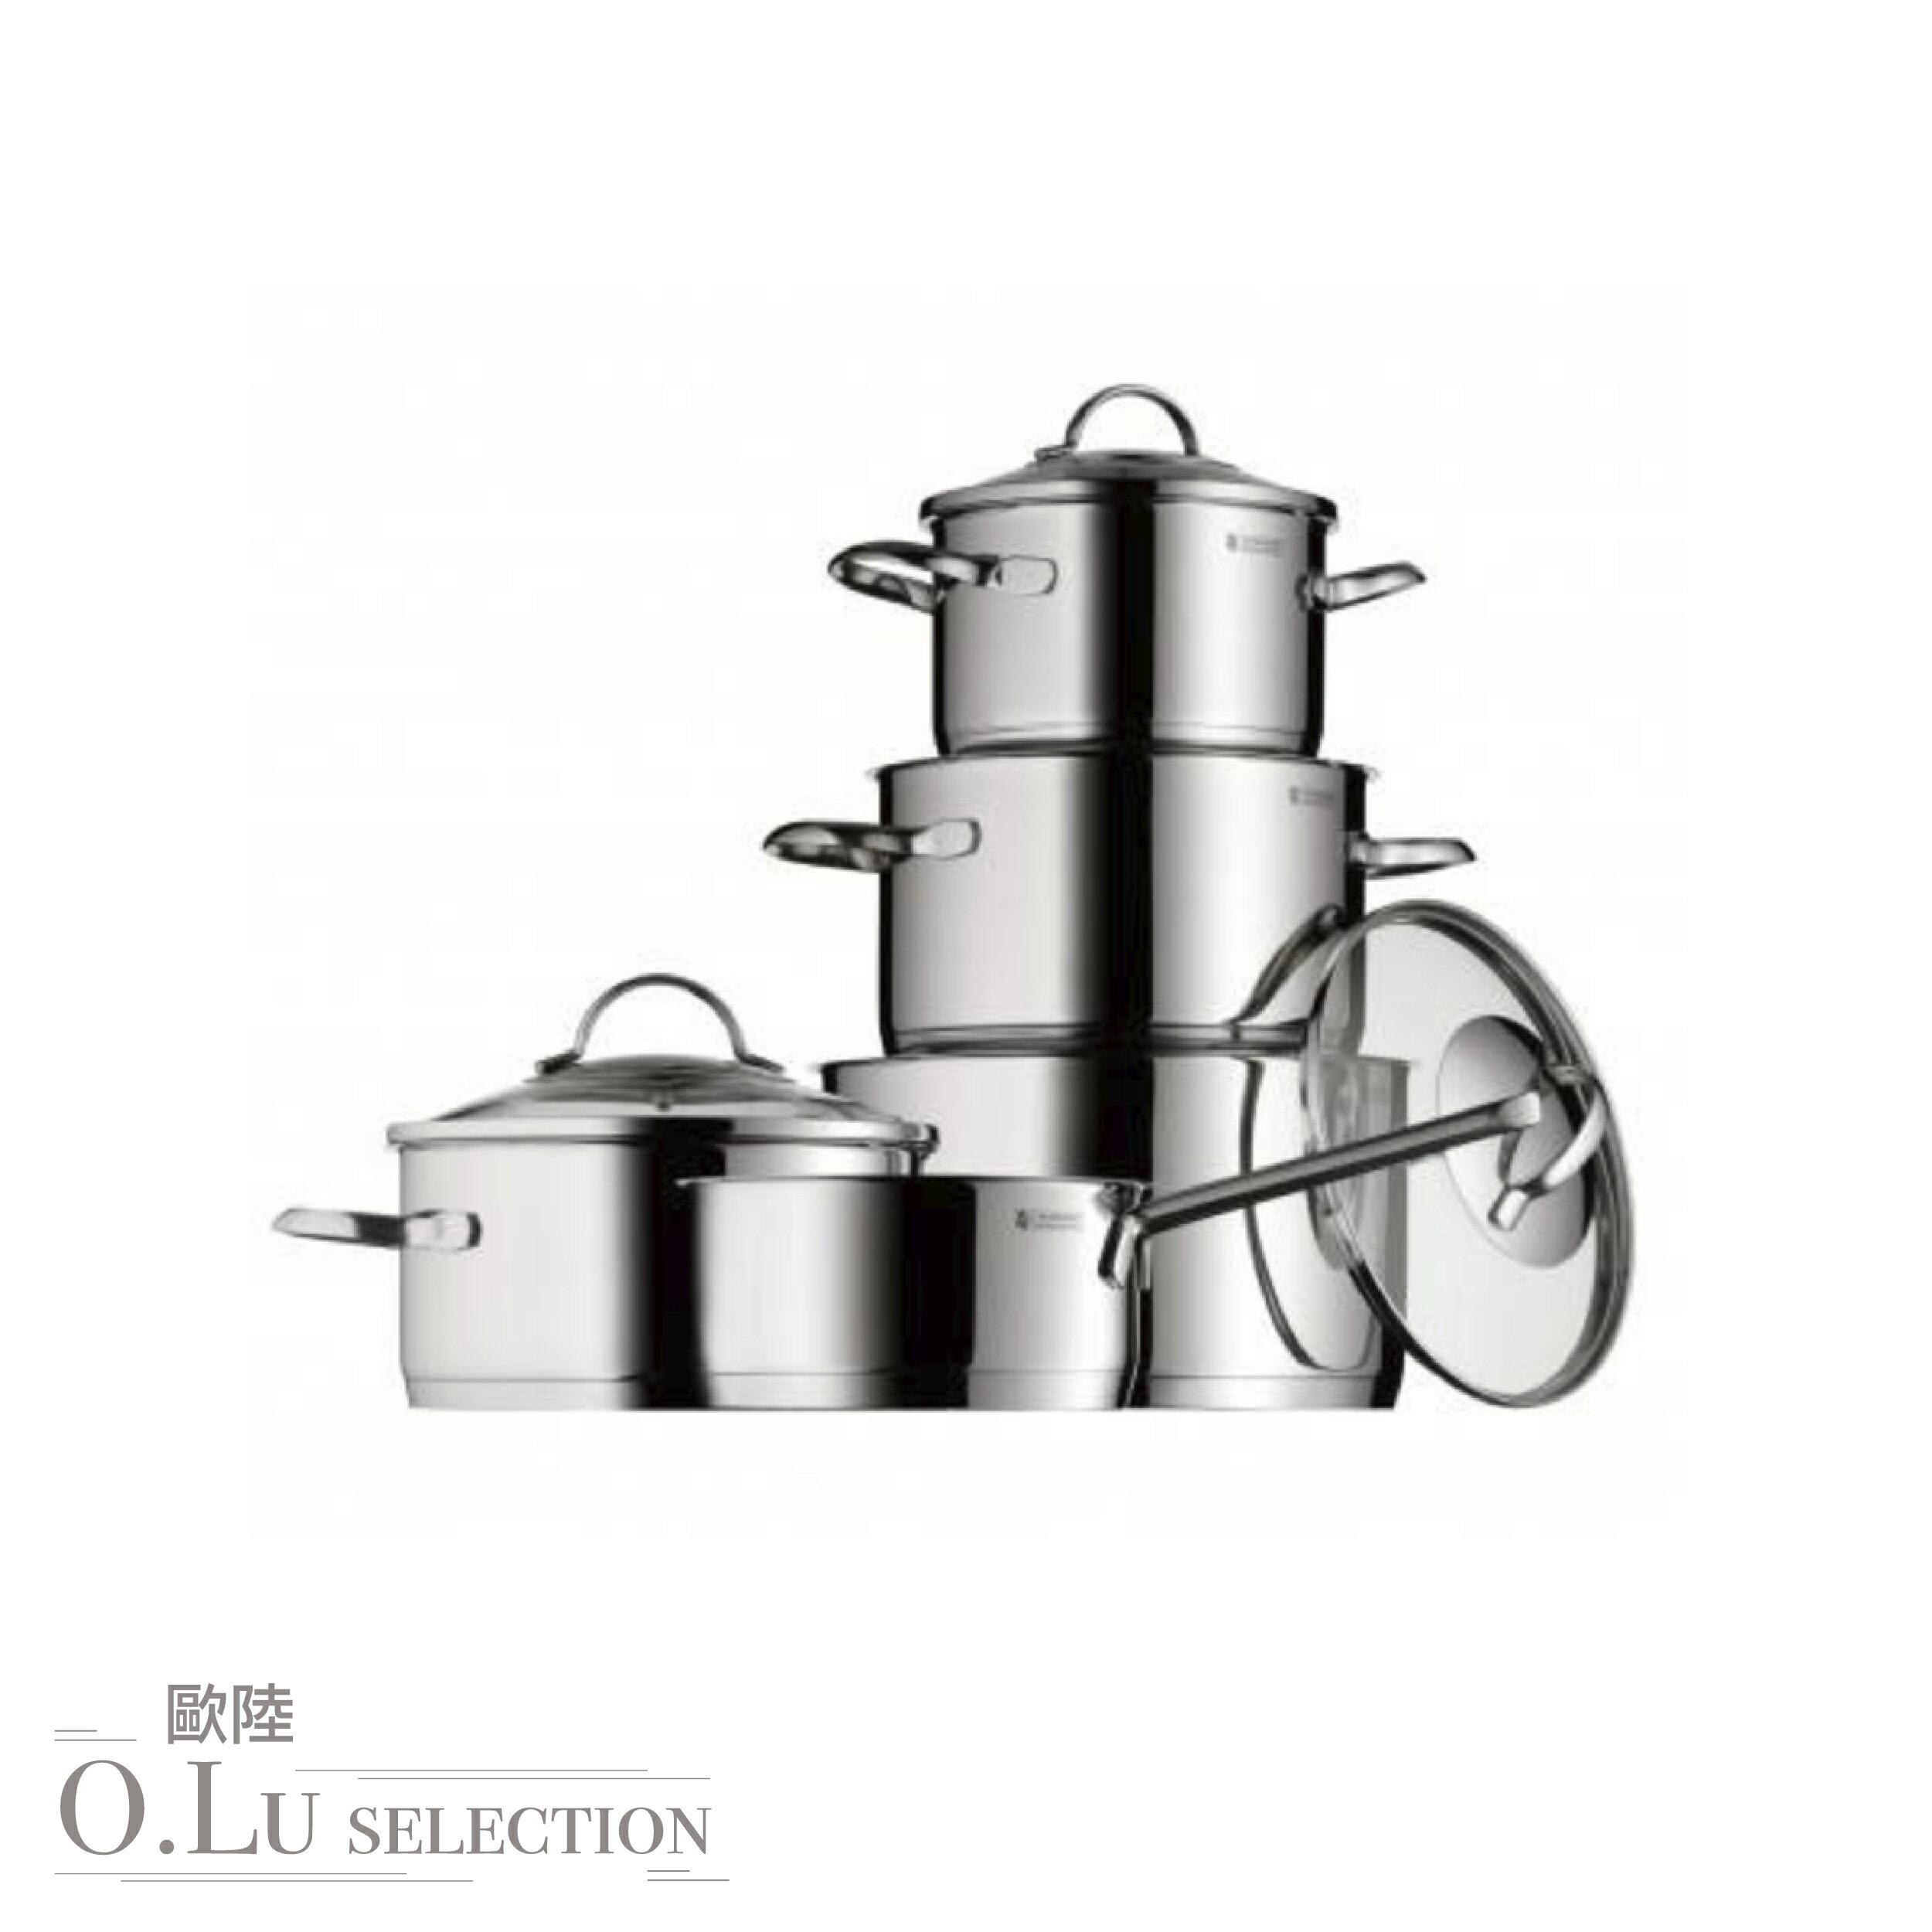 德國 WMF Cookware set PROVENCE PLUS 不鏽鋼鍋 五件組 0